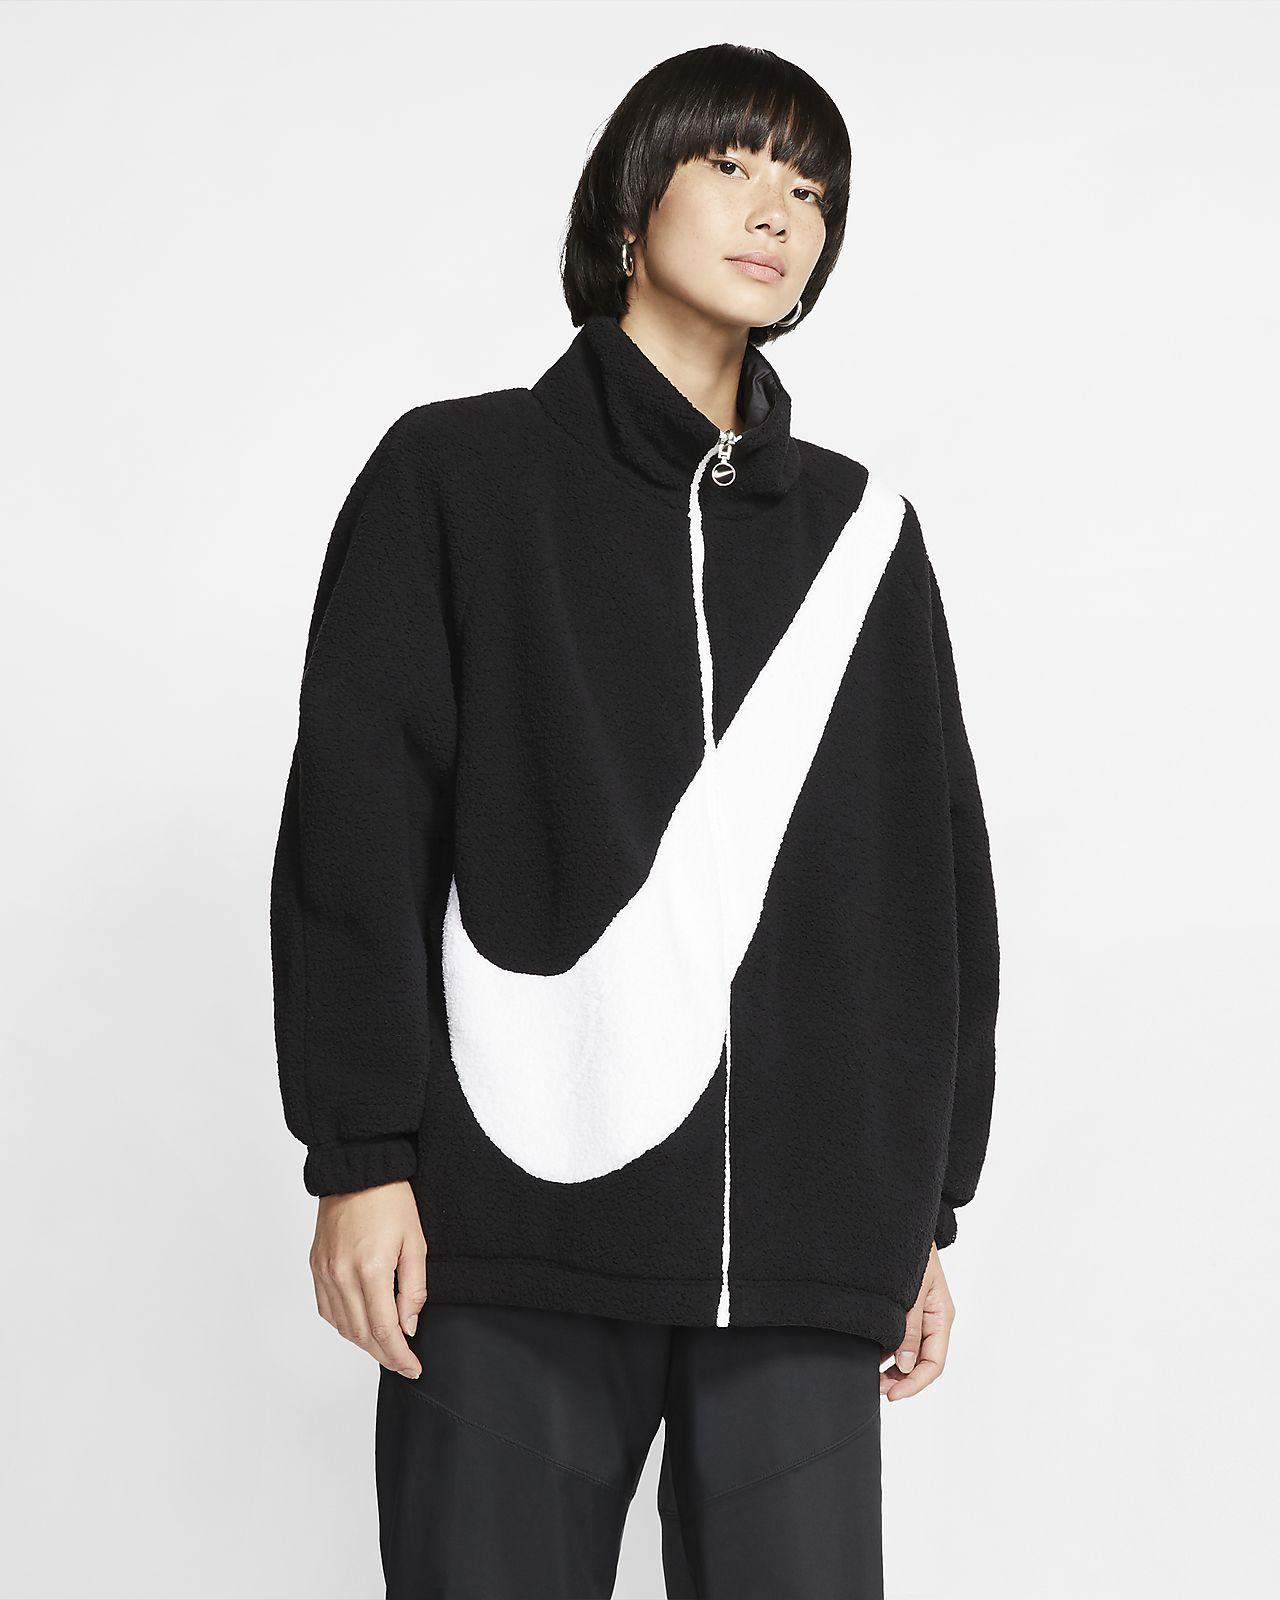 Nike Sportswear Air Force 1 Reversible Jacket Black Light